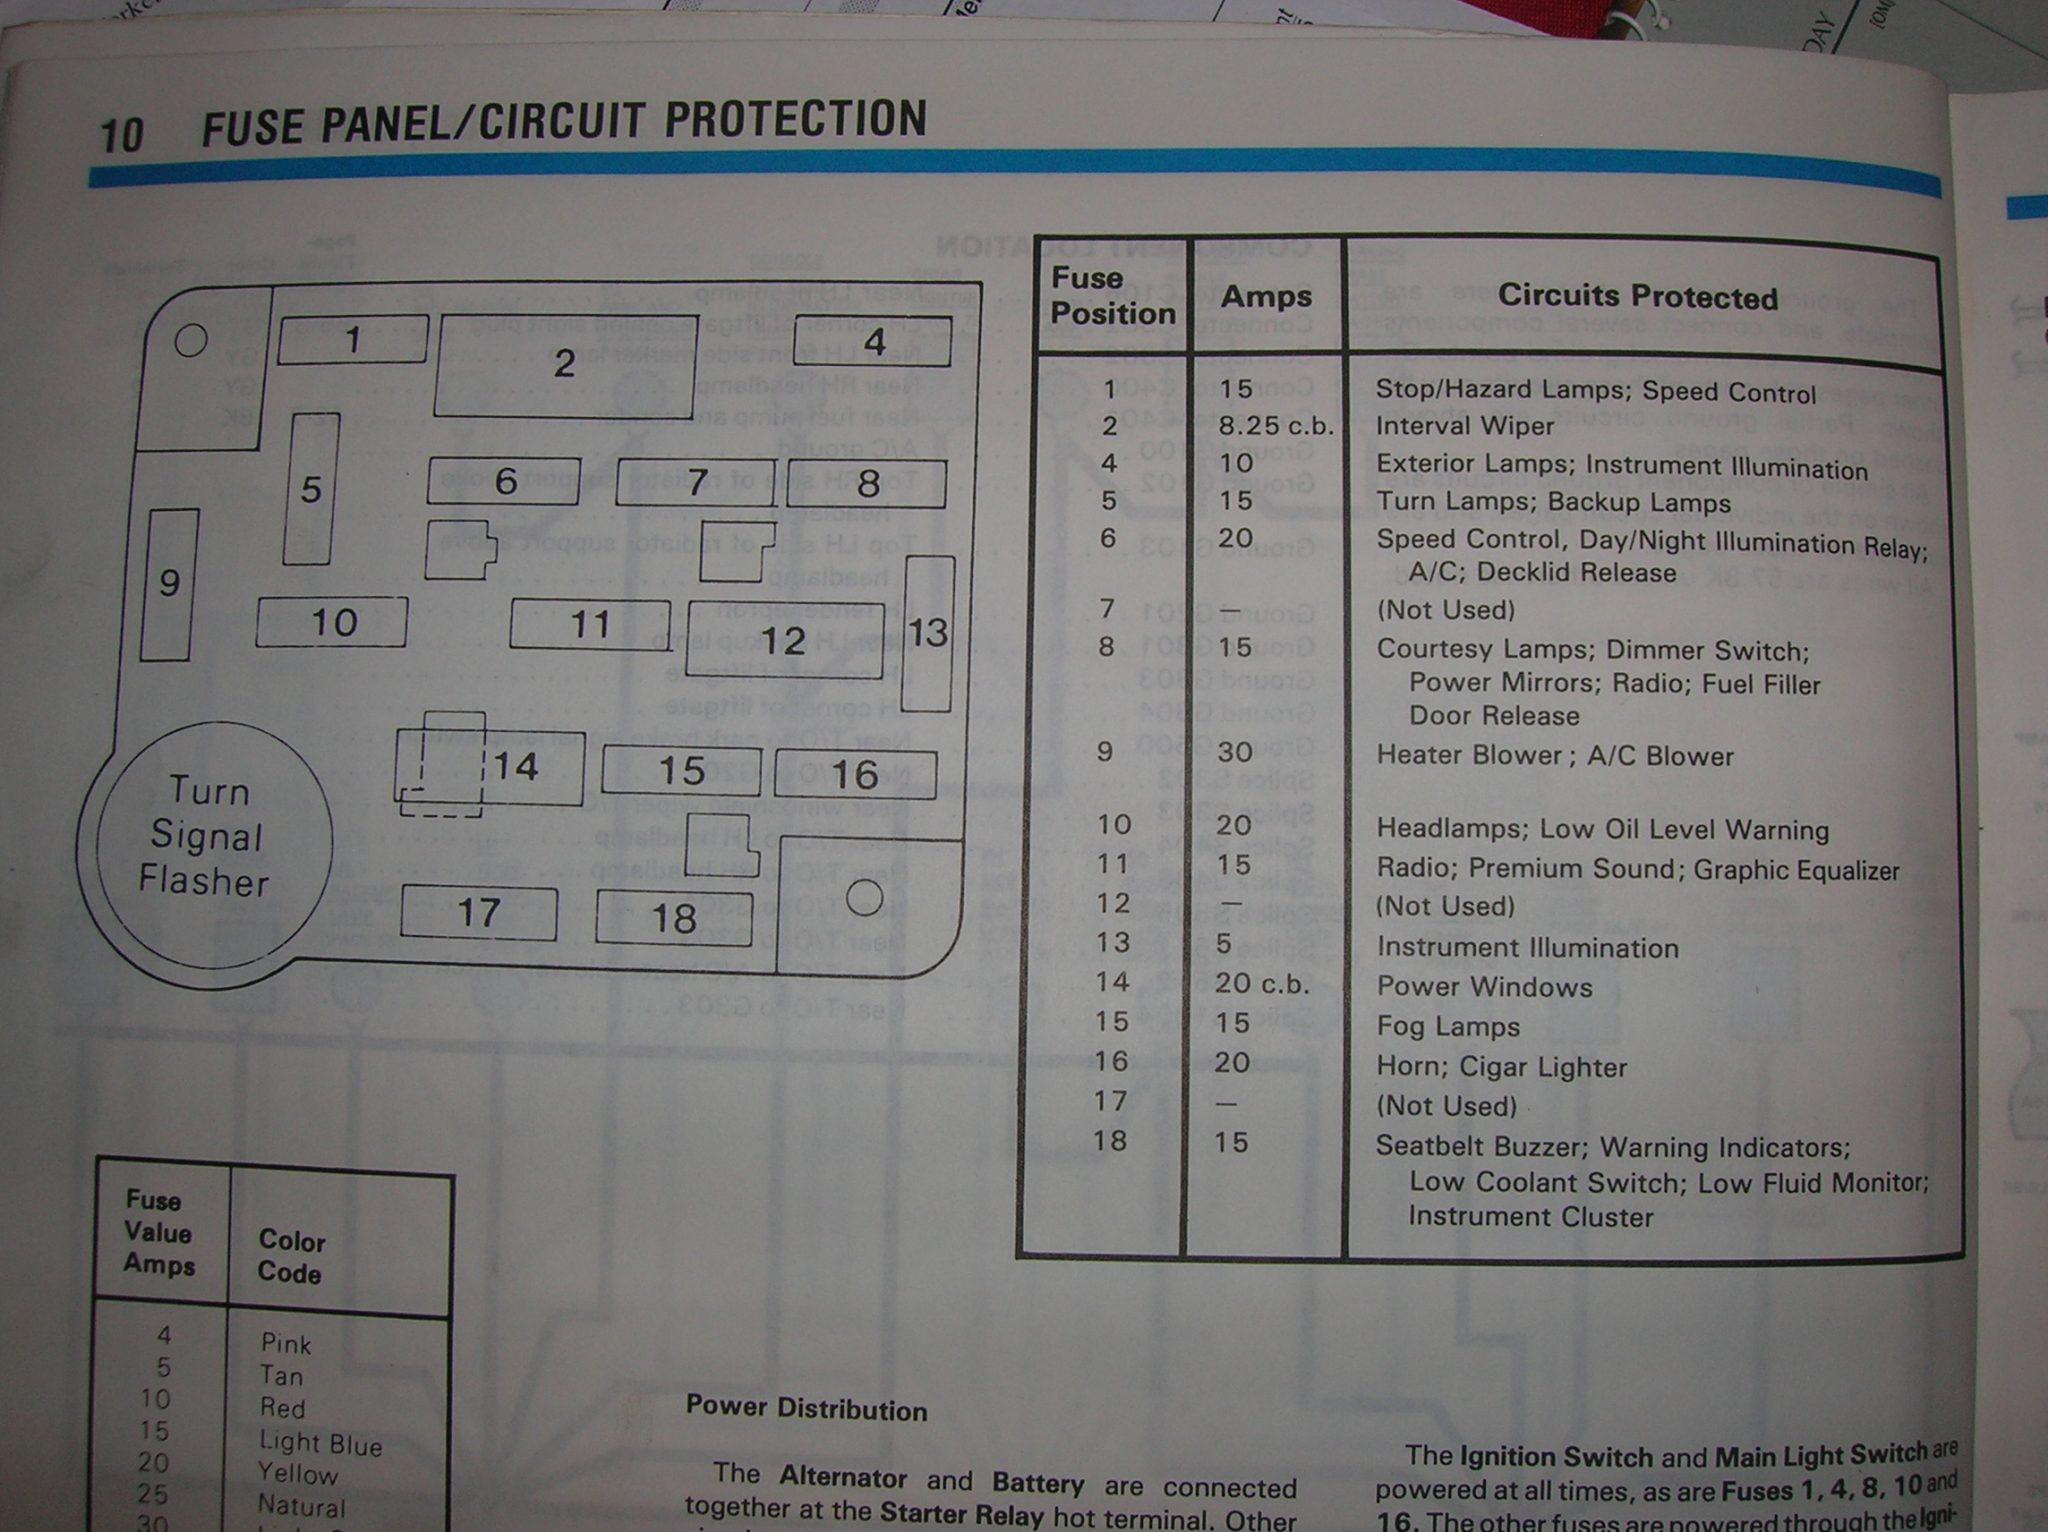 84 Mustang Fuse Box Data Wiring Diagram Online Electrical Diagrams 1999 1987